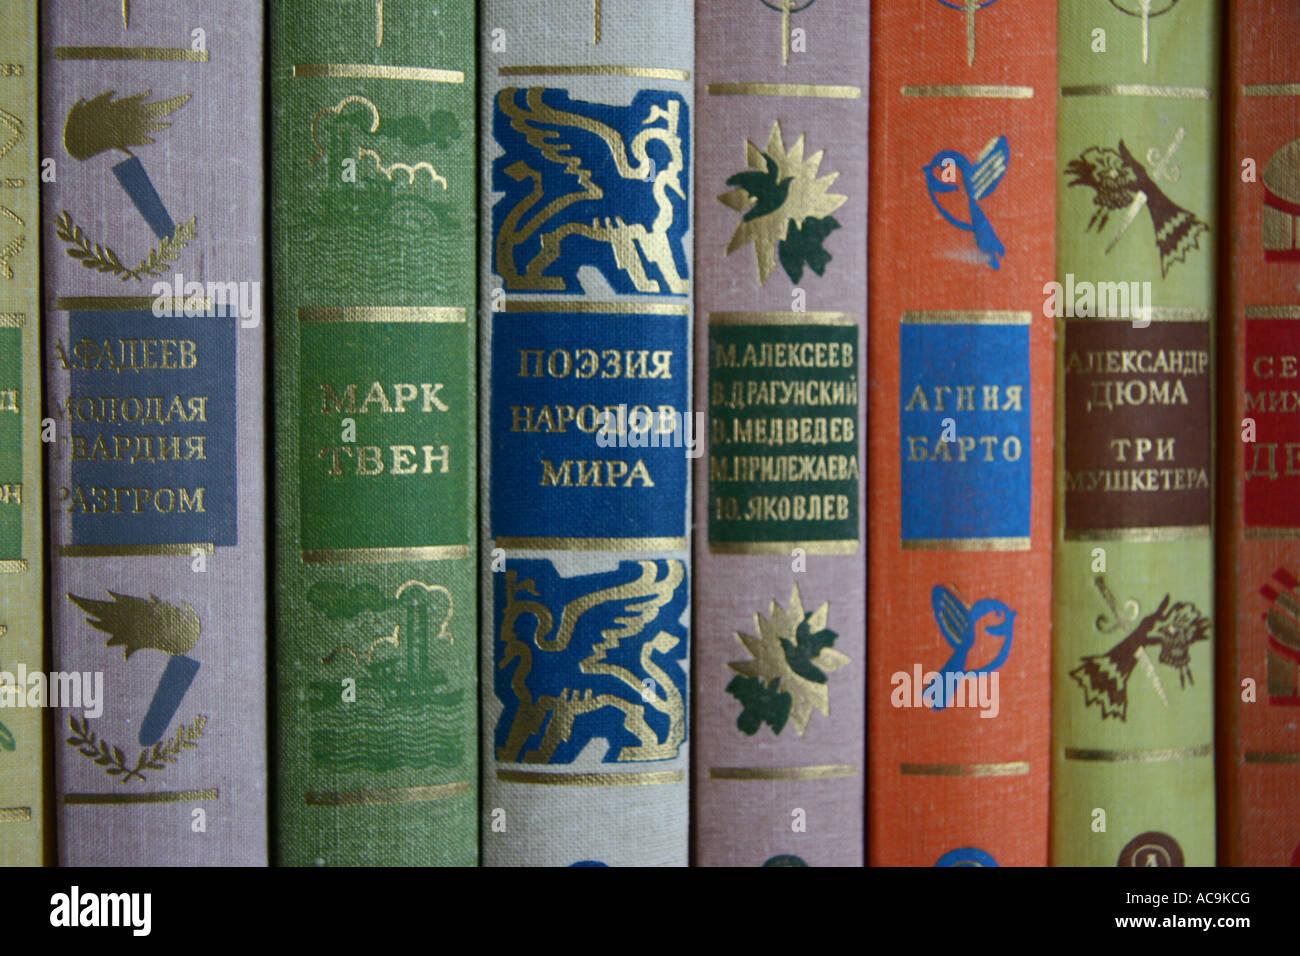 Books in Russian, Yerevan, Armenia - Stock Image